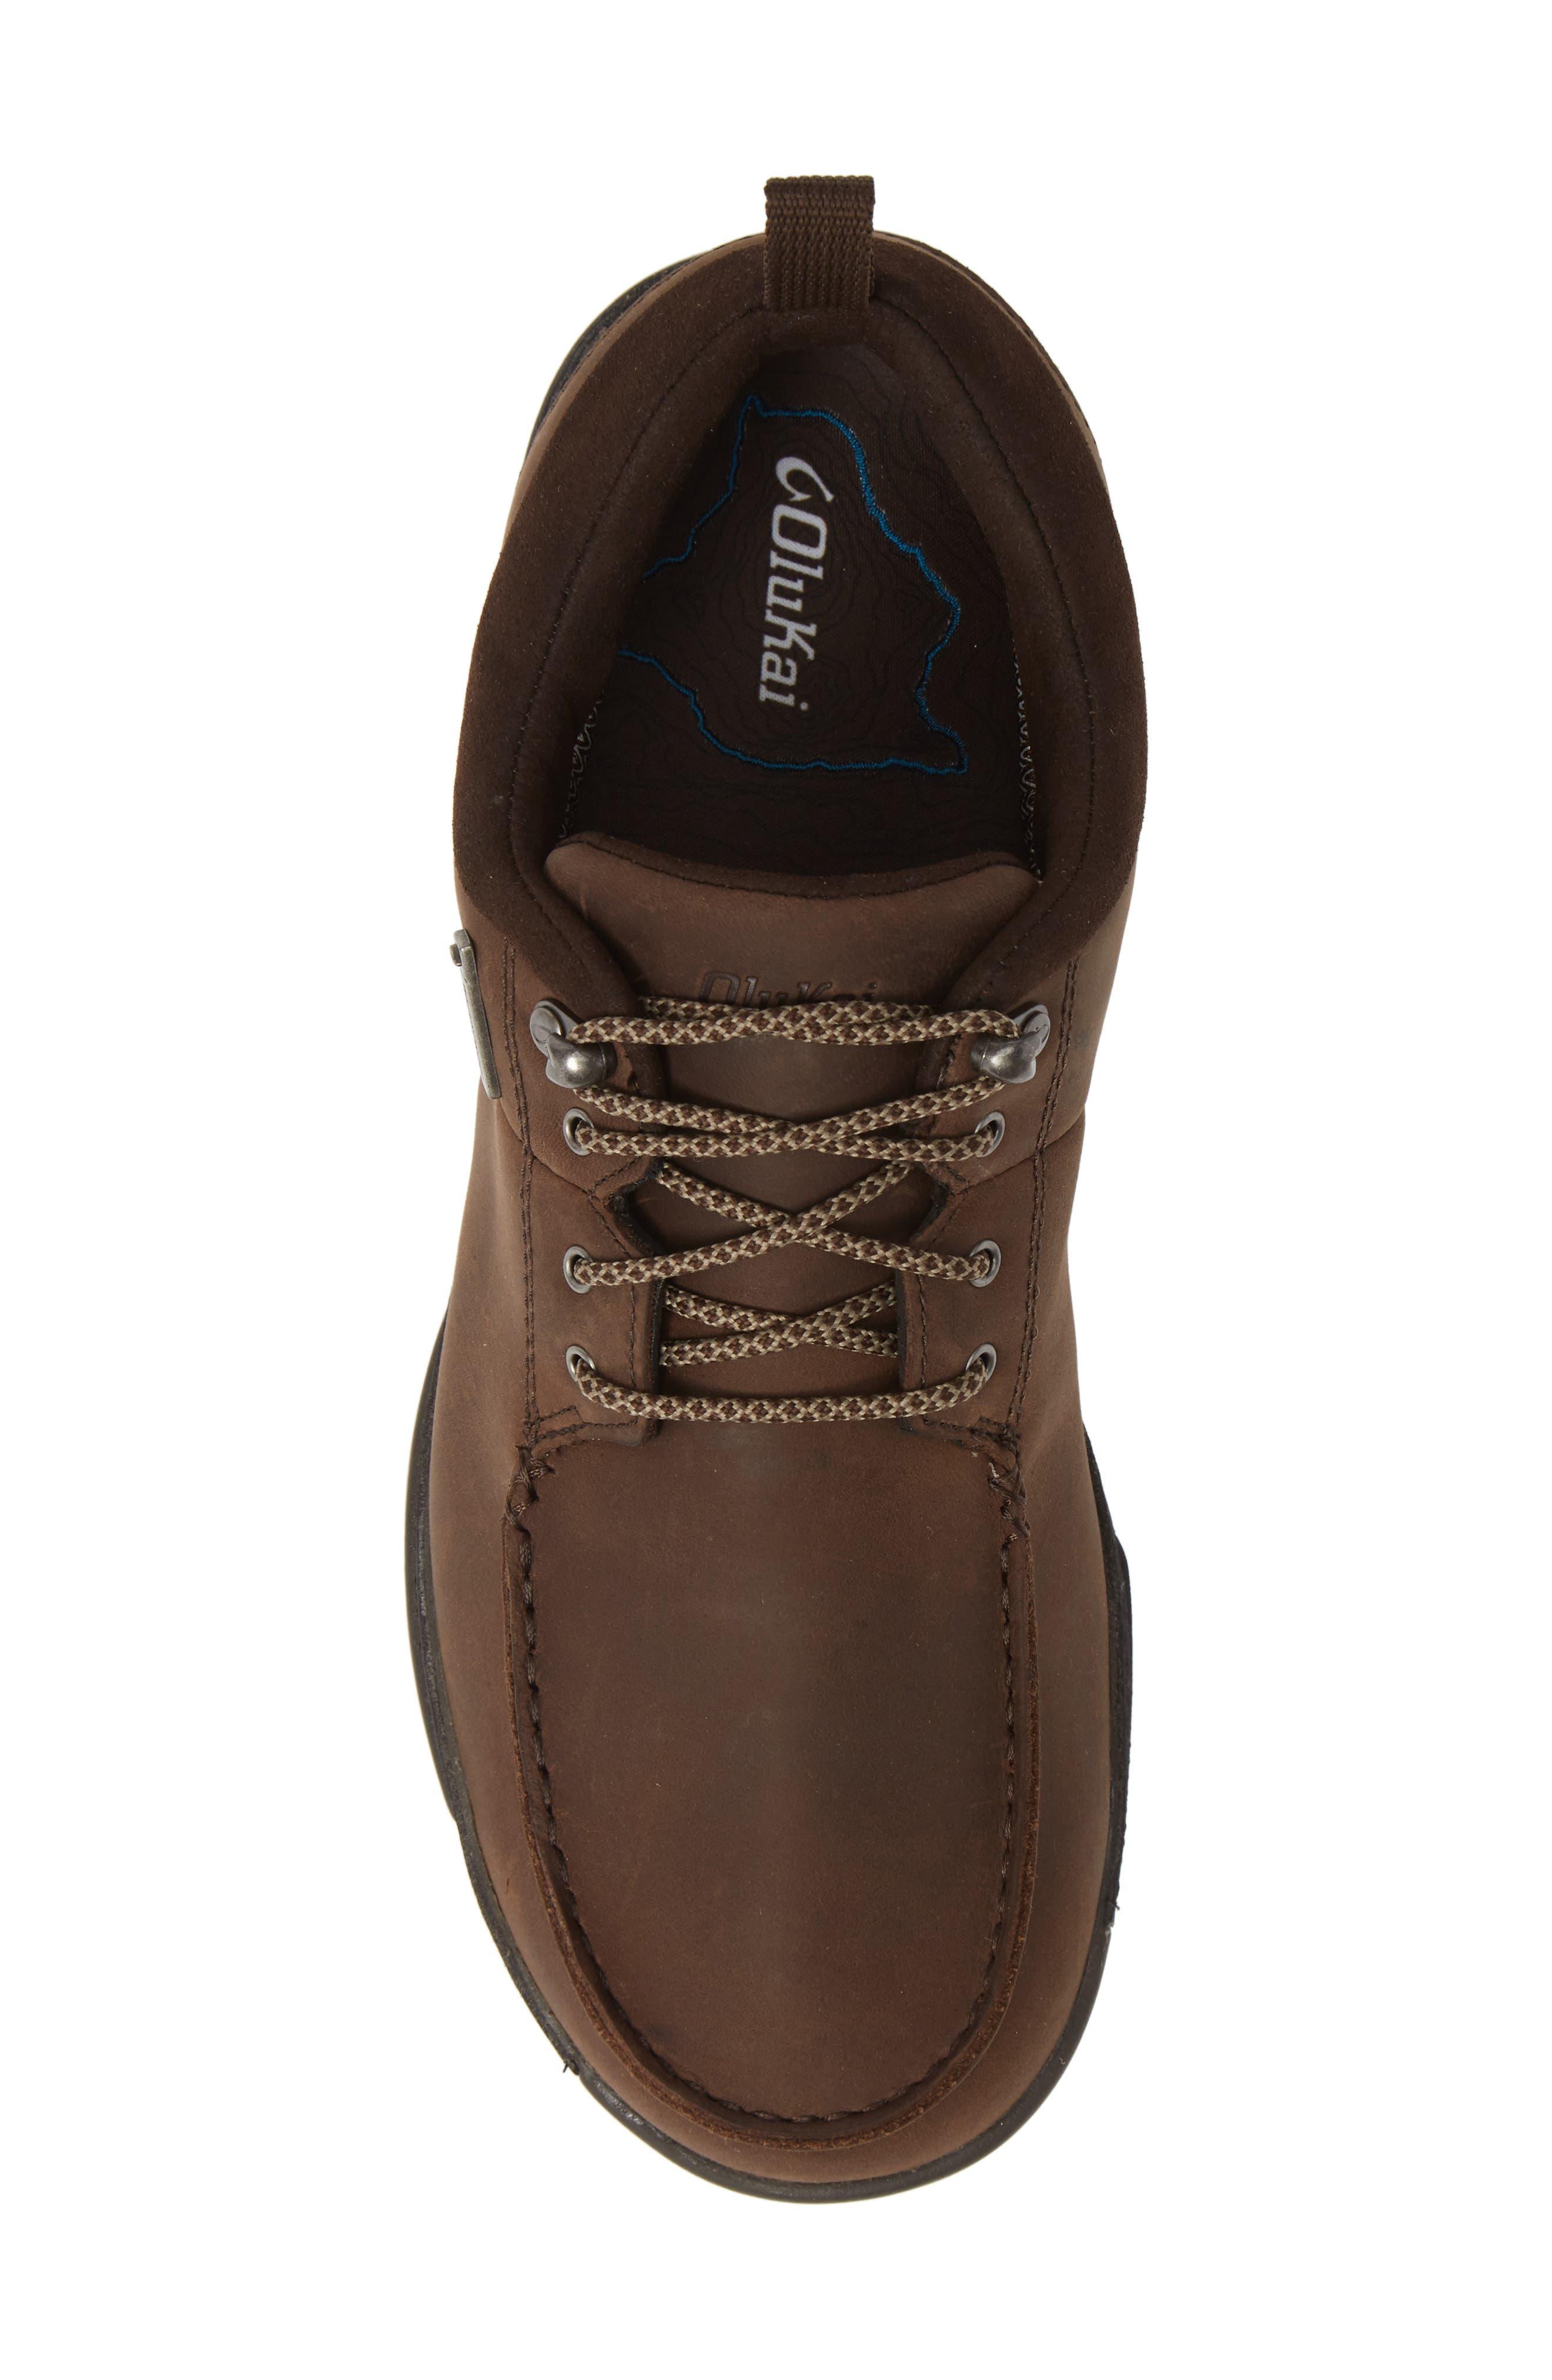 Makoa Waterproof Shoe,                             Alternate thumbnail 5, color,                             ESPRESSO/ BLACK LEATHER